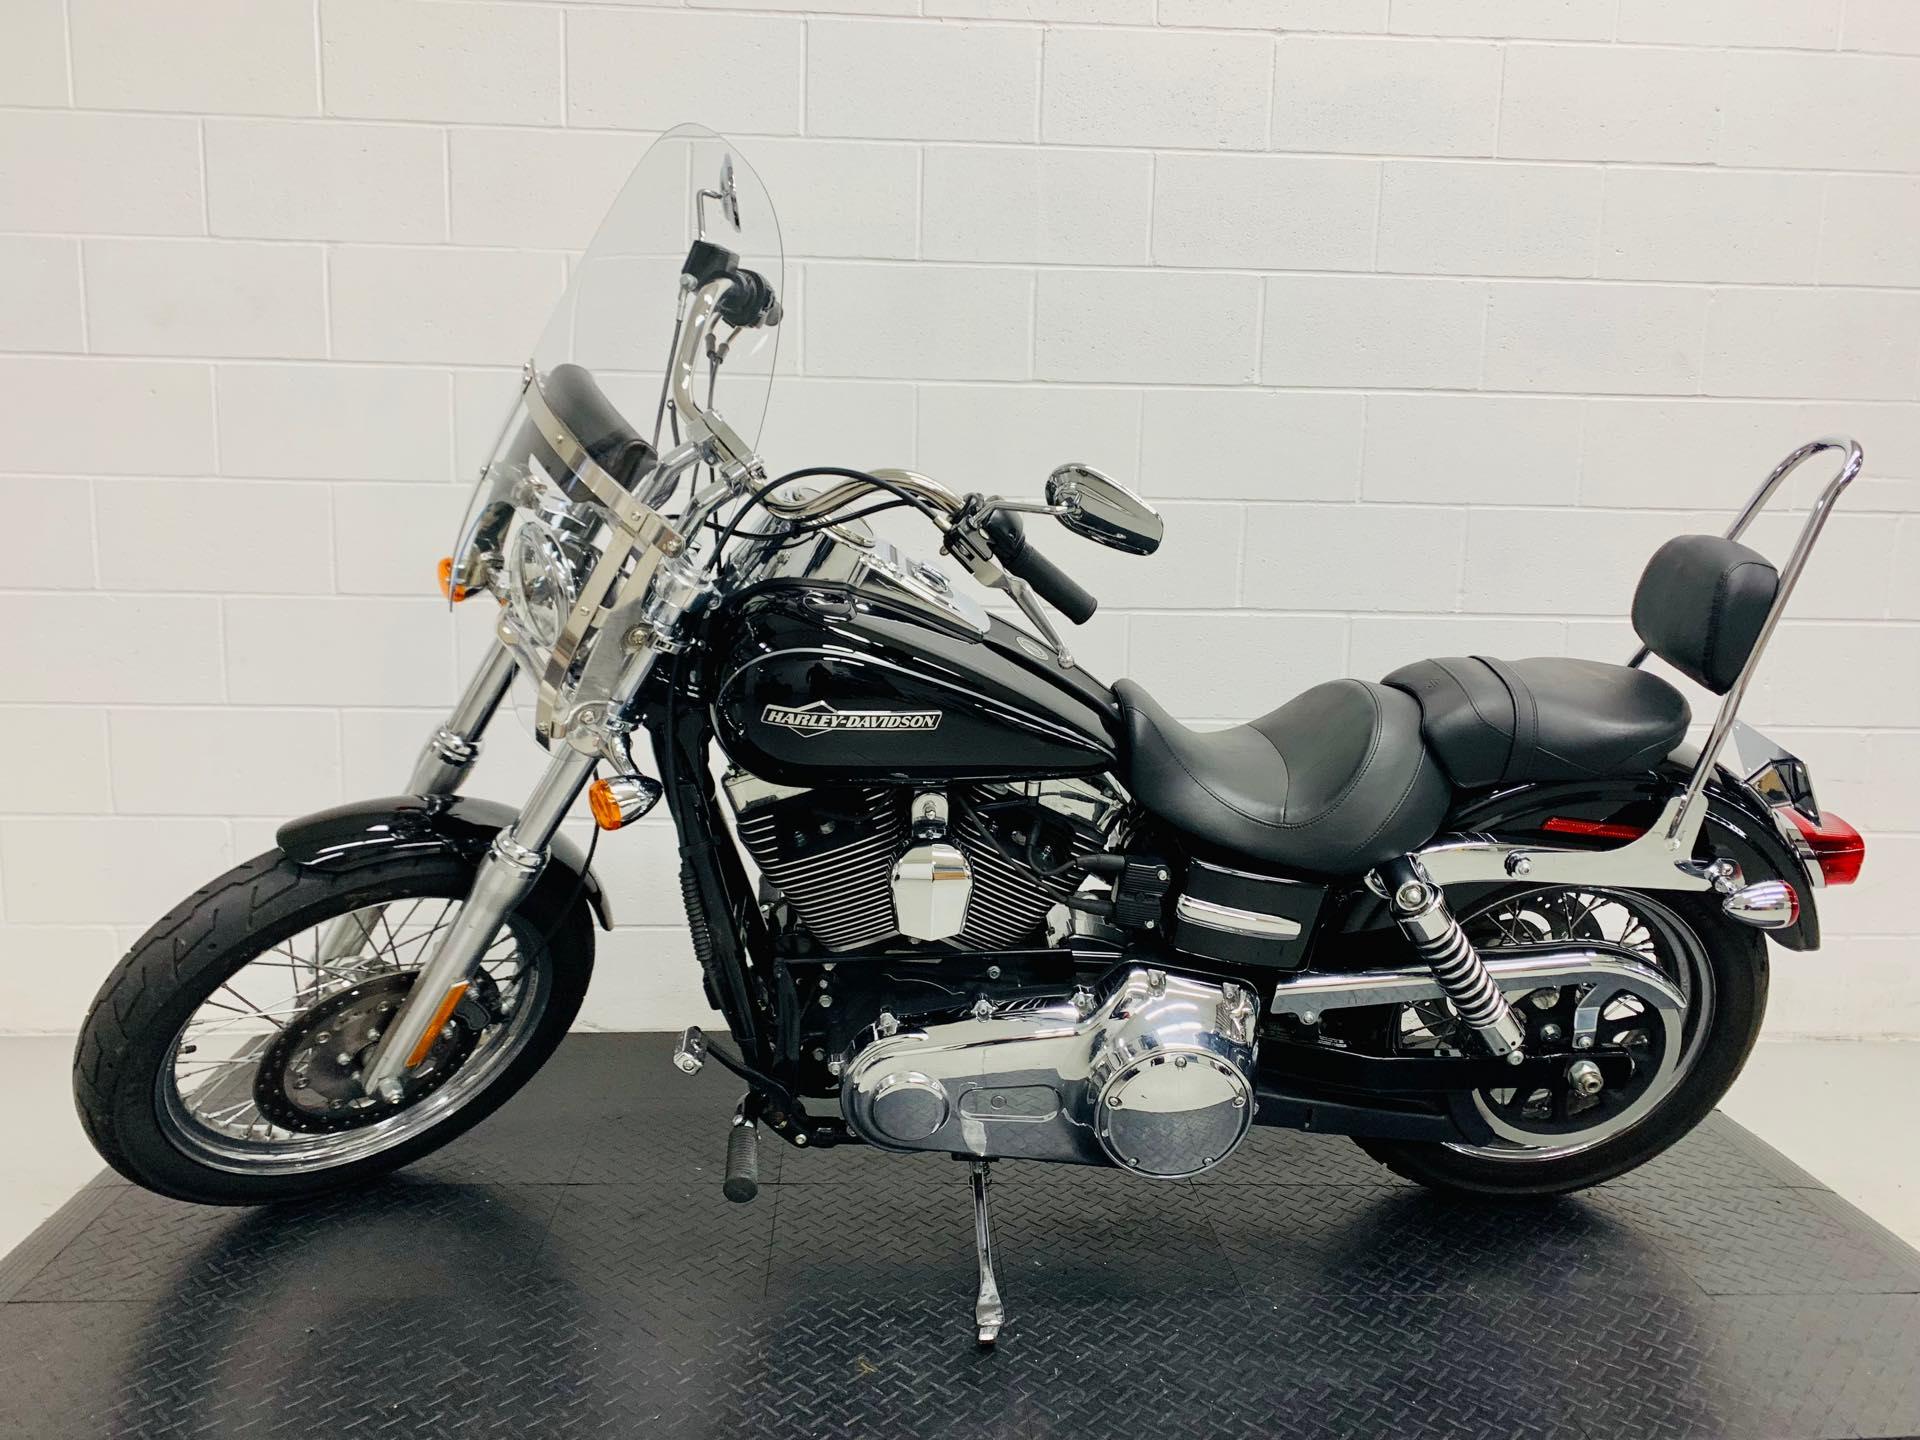 2013 Harley-Davidson Dyna Super Glide Custom at Destination Harley-Davidson®, Silverdale, WA 98383